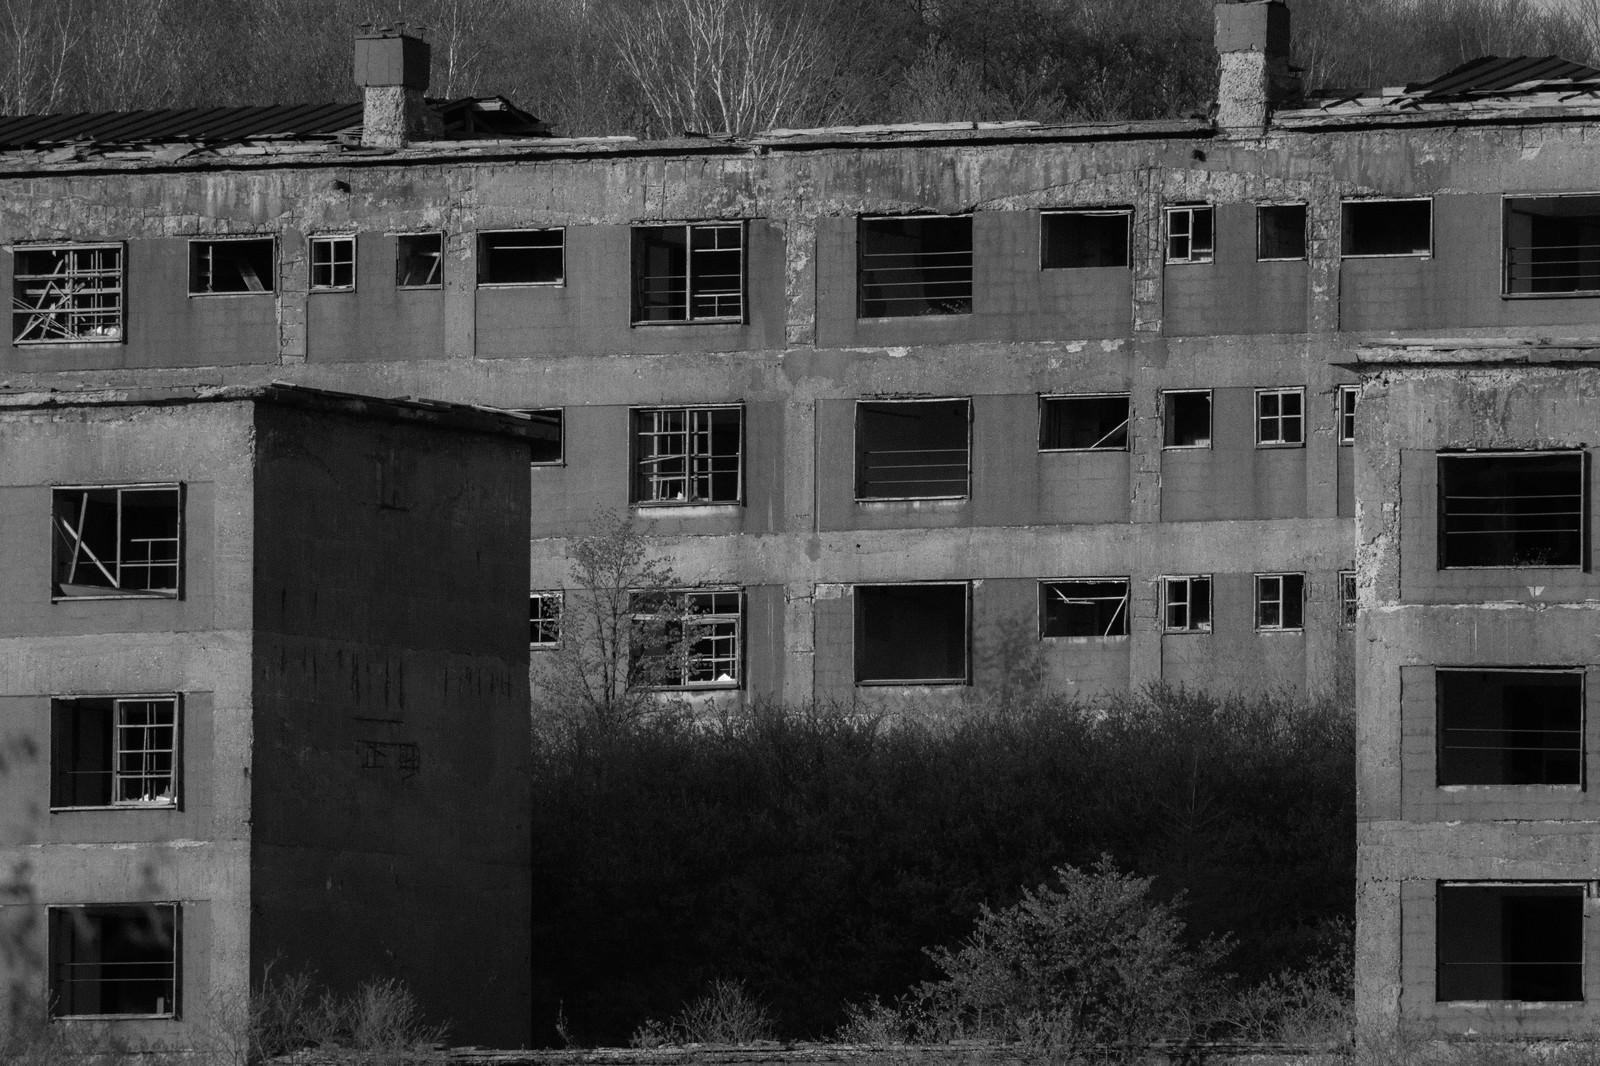 「産業遺産、松尾鉱山跡」の写真